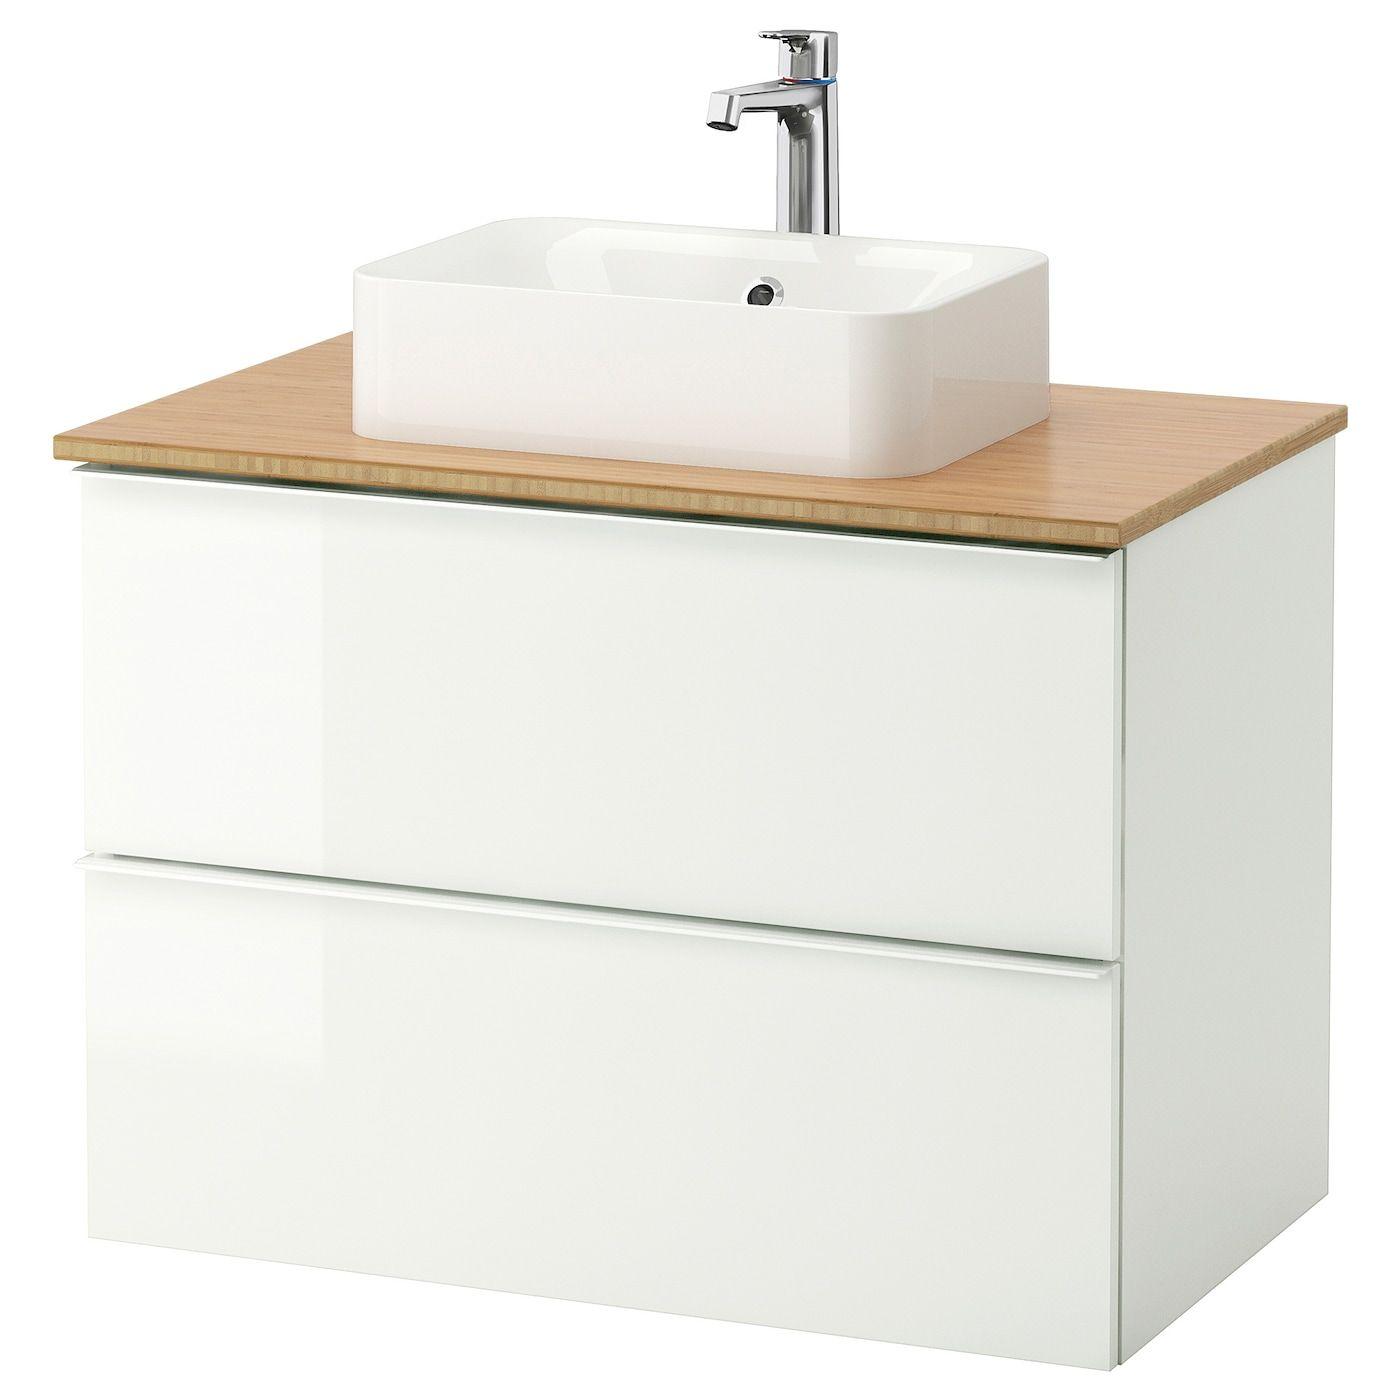 GODMORGON/TOLKEN / HÖRVIK Armario/lavabo +encimera en 15